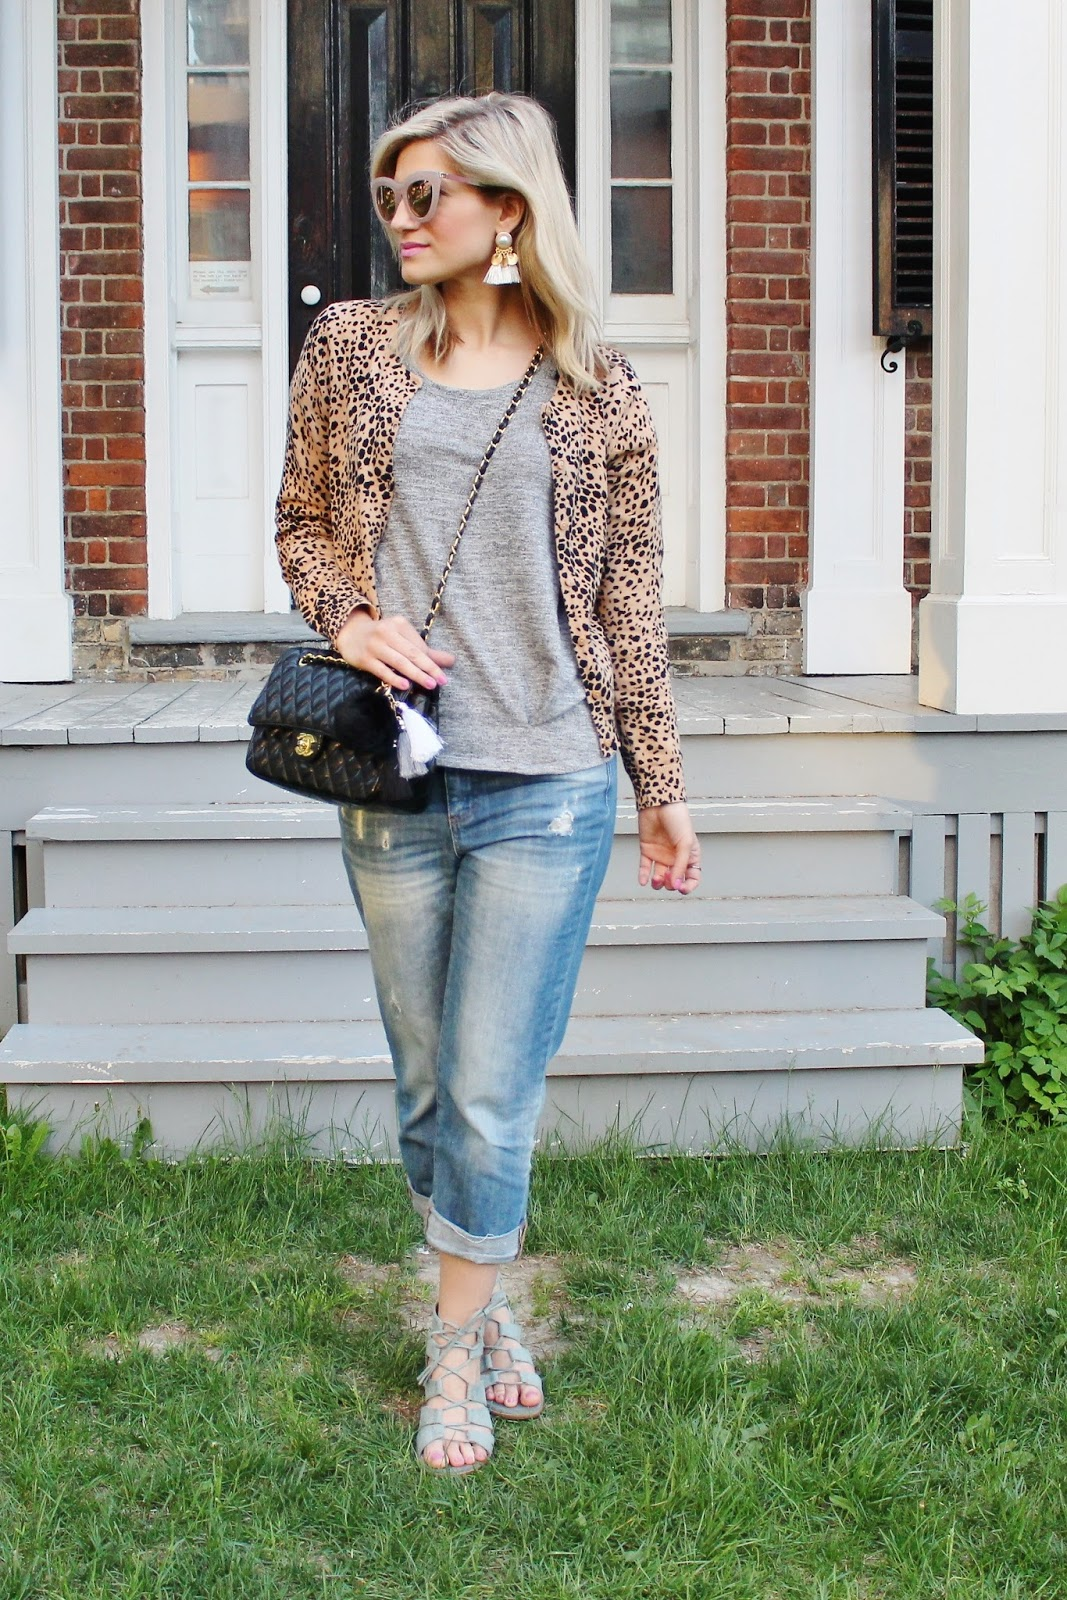 Bijuleni - Leopard cardi, boyfriend jeans and vintage Chanel